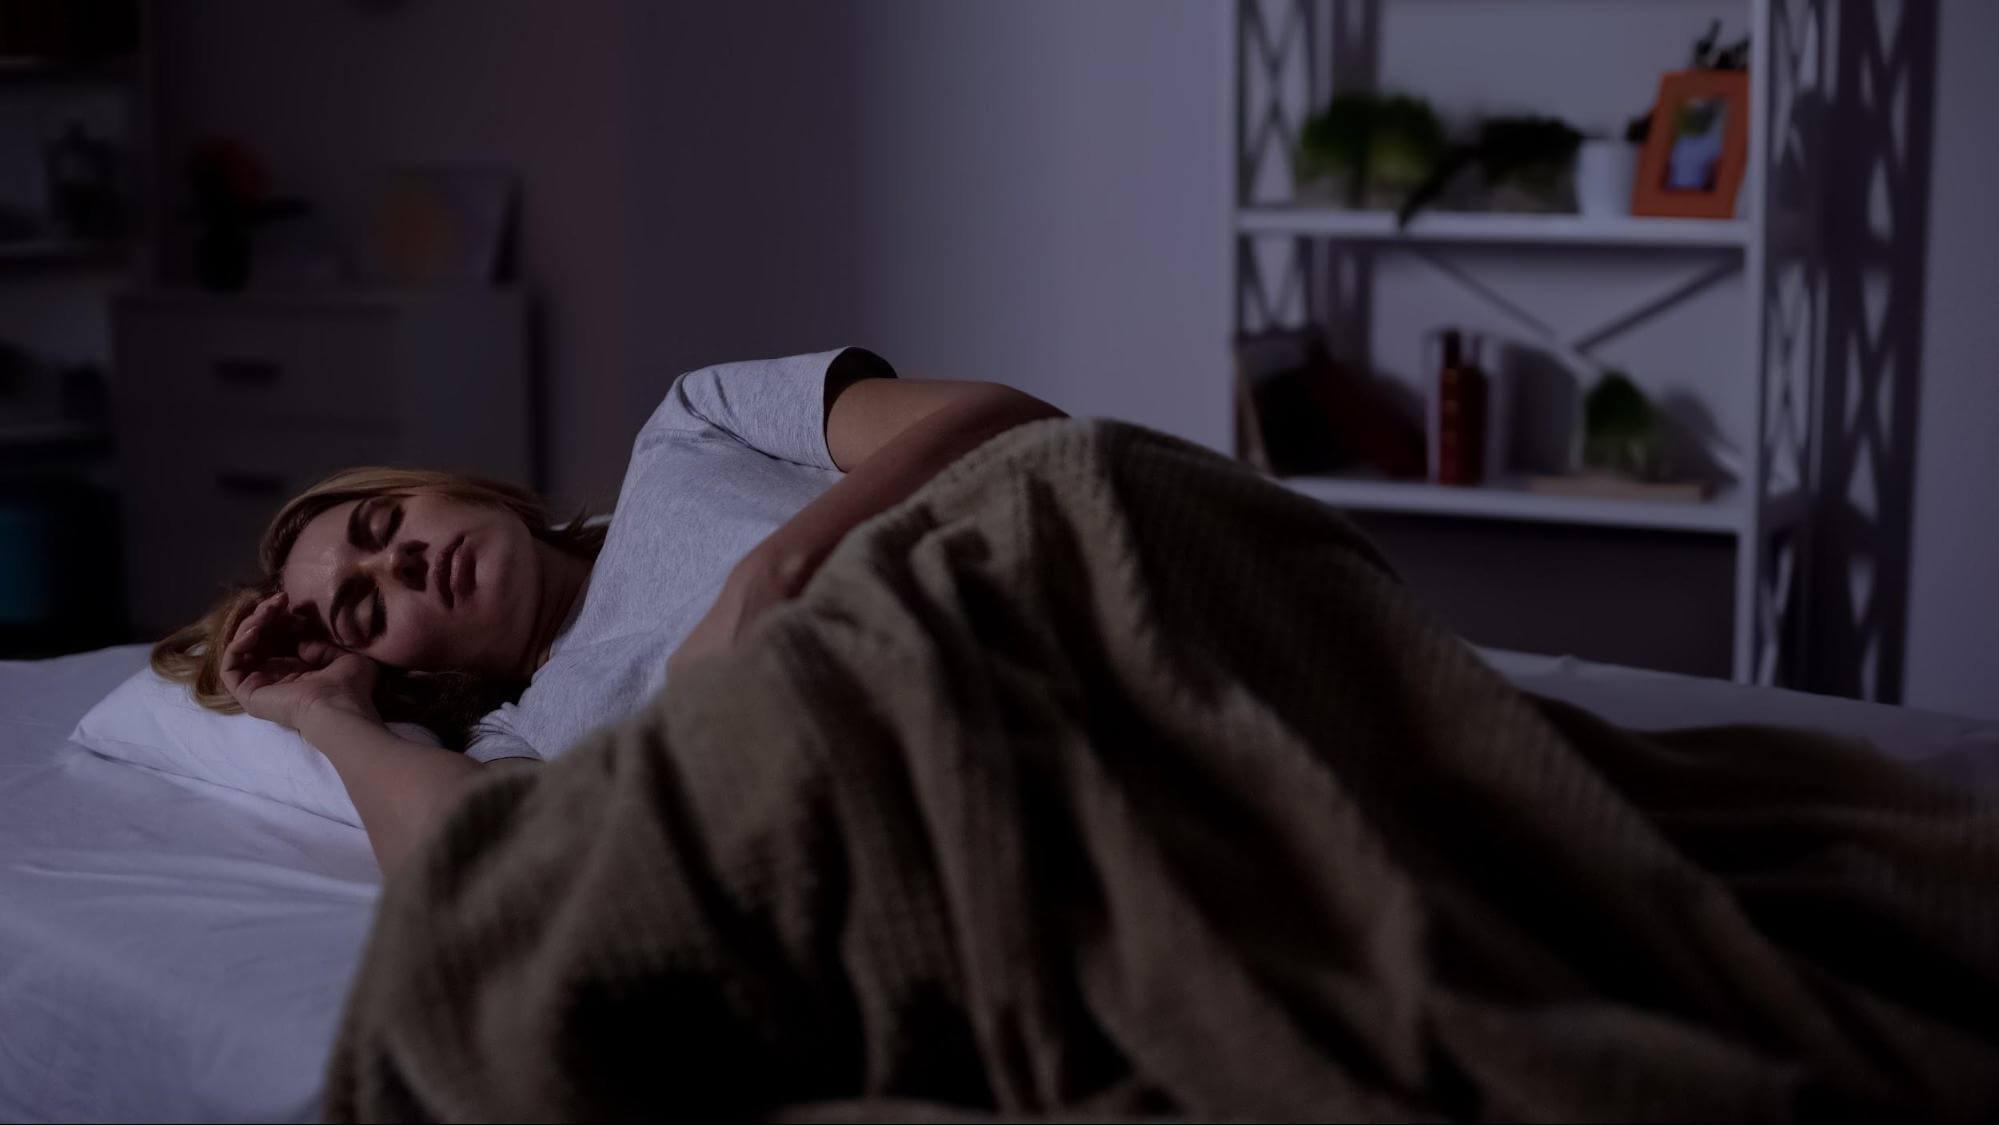 disturbios do sono como evitar